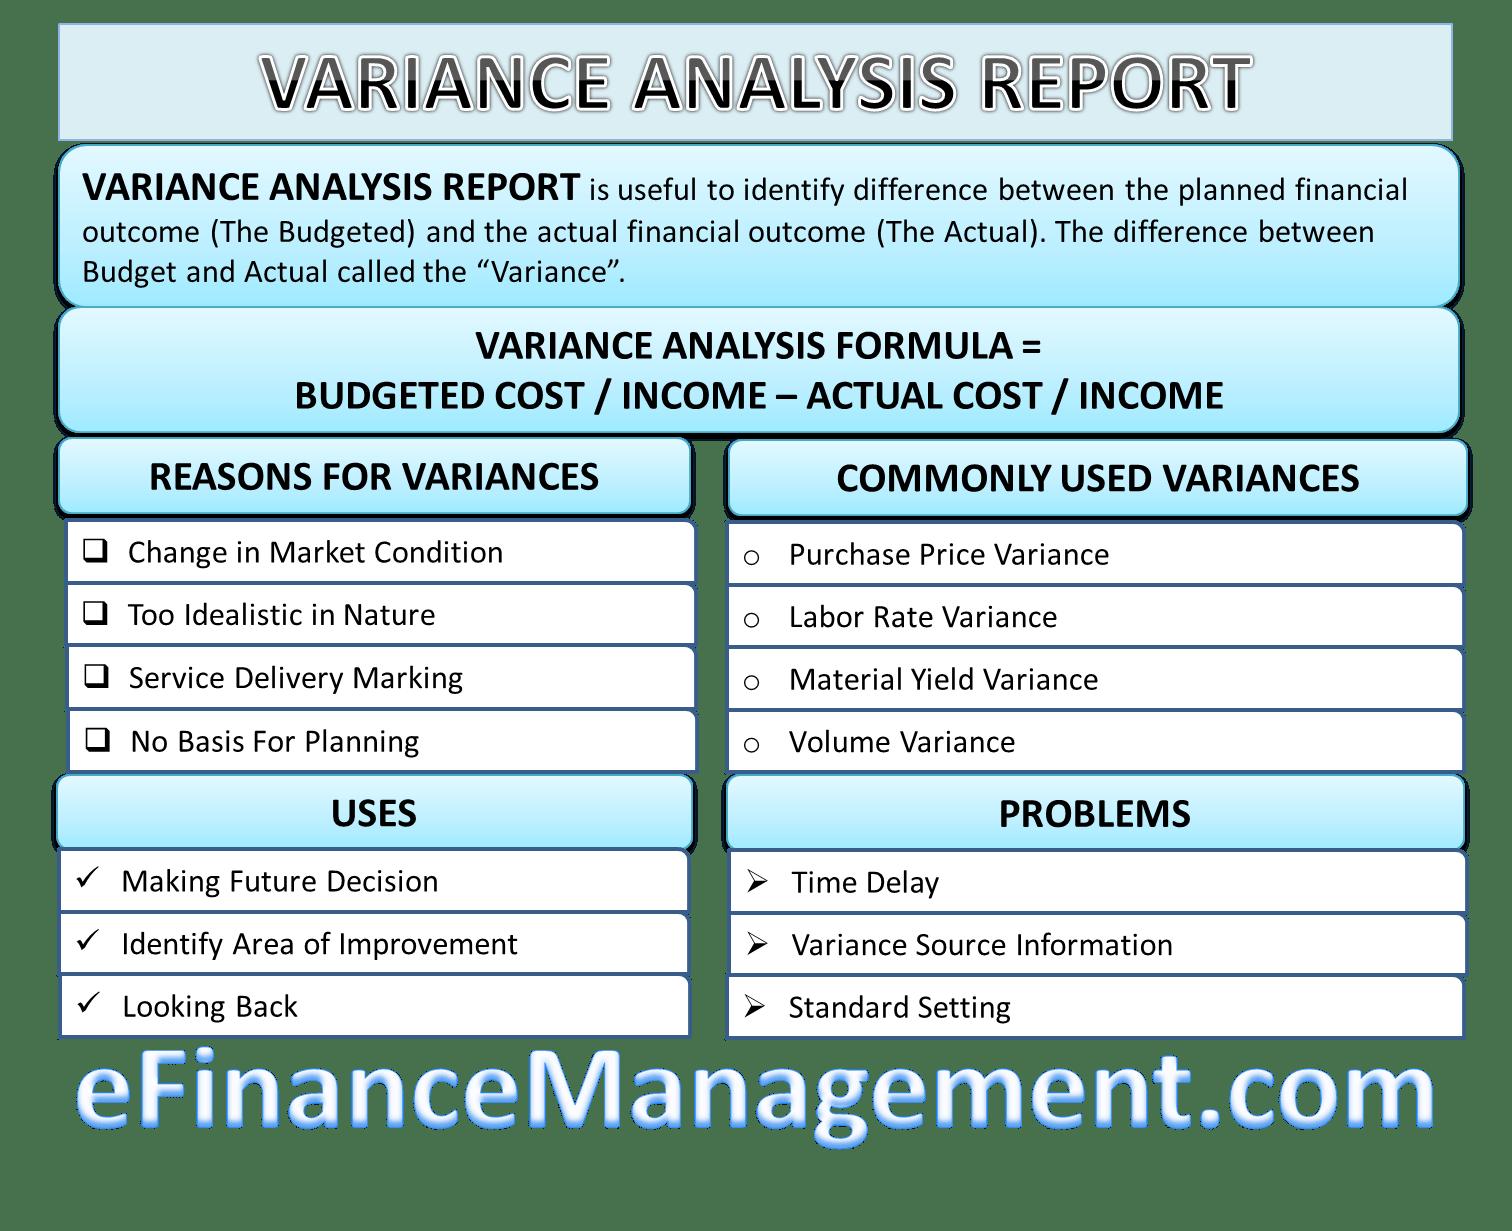 Varianceysis Report